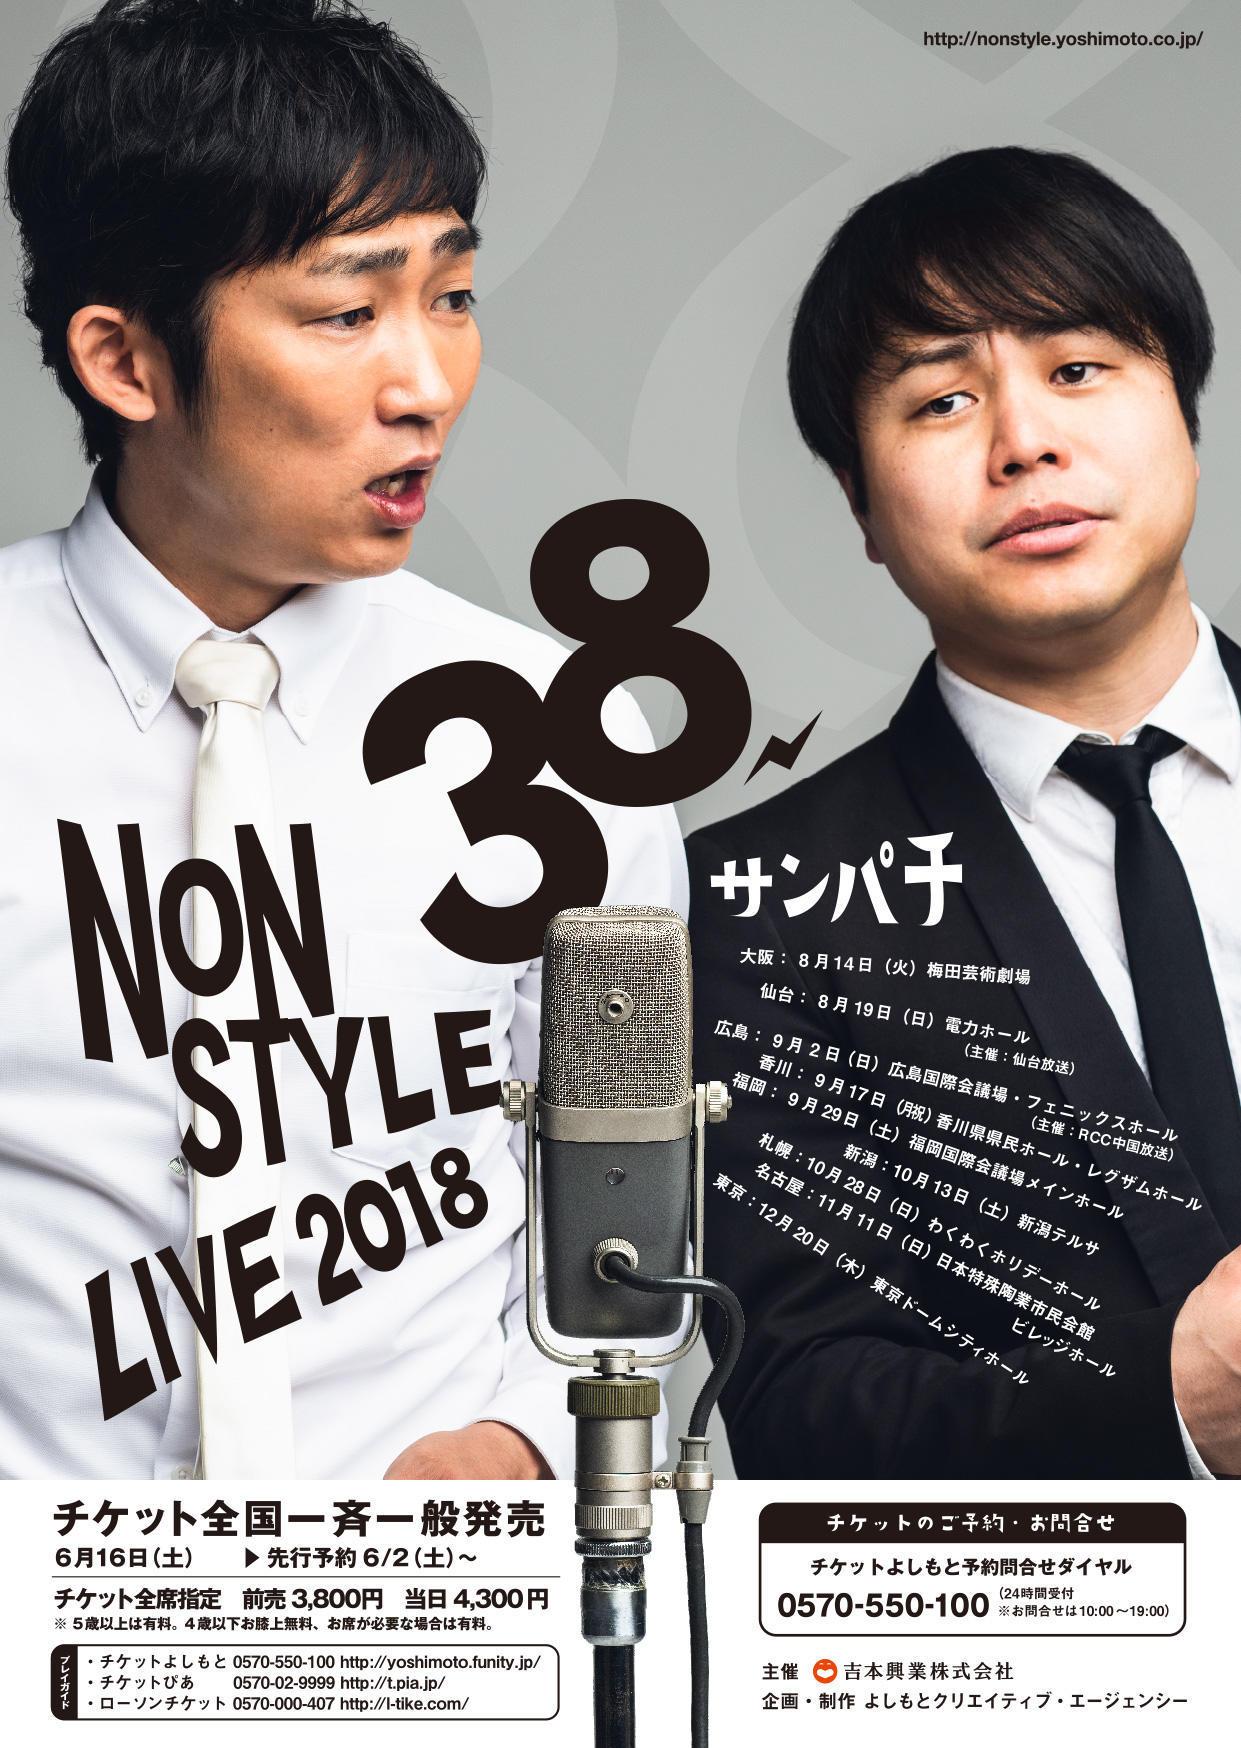 http://news.yoshimoto.co.jp/20180601114906-843ec0241d0b97a96e0fe859eae5748865510a67.jpg